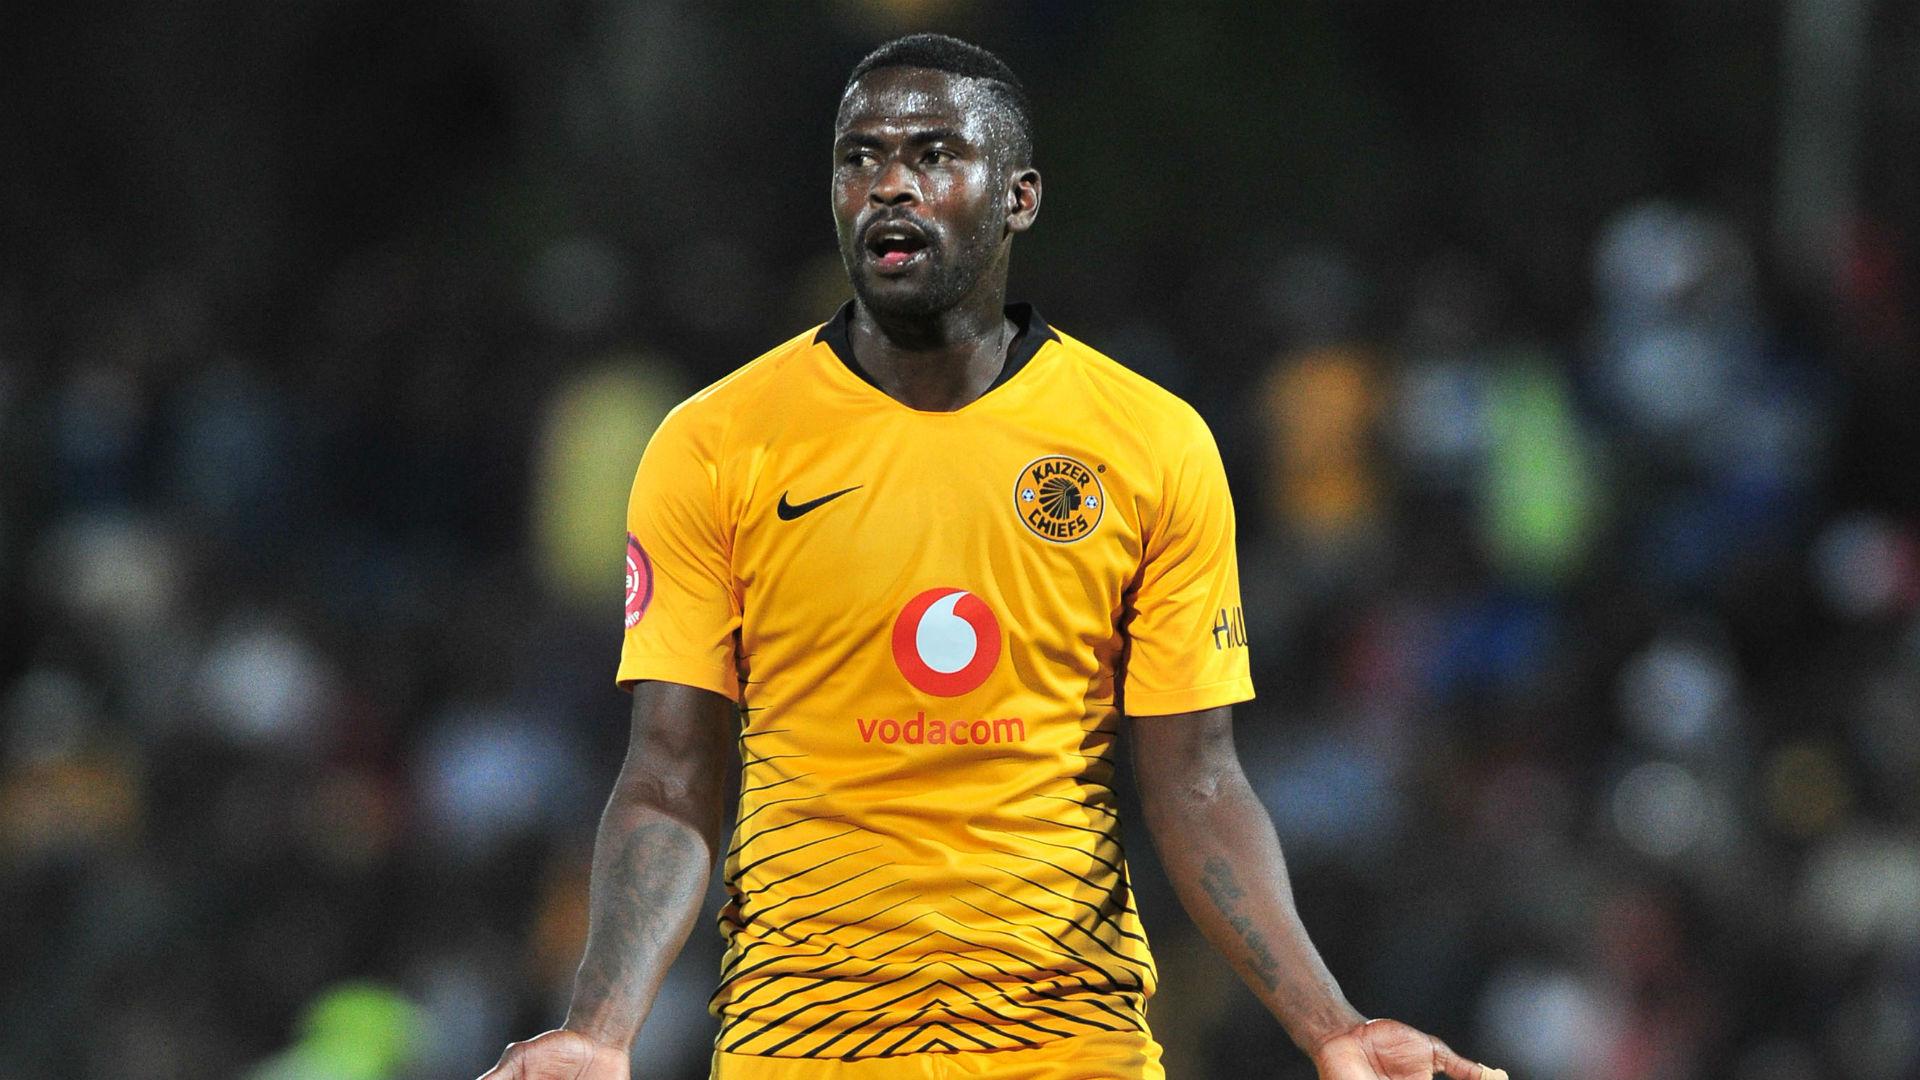 Kgotso Moleko, Kaizer Chiefs, January 2019